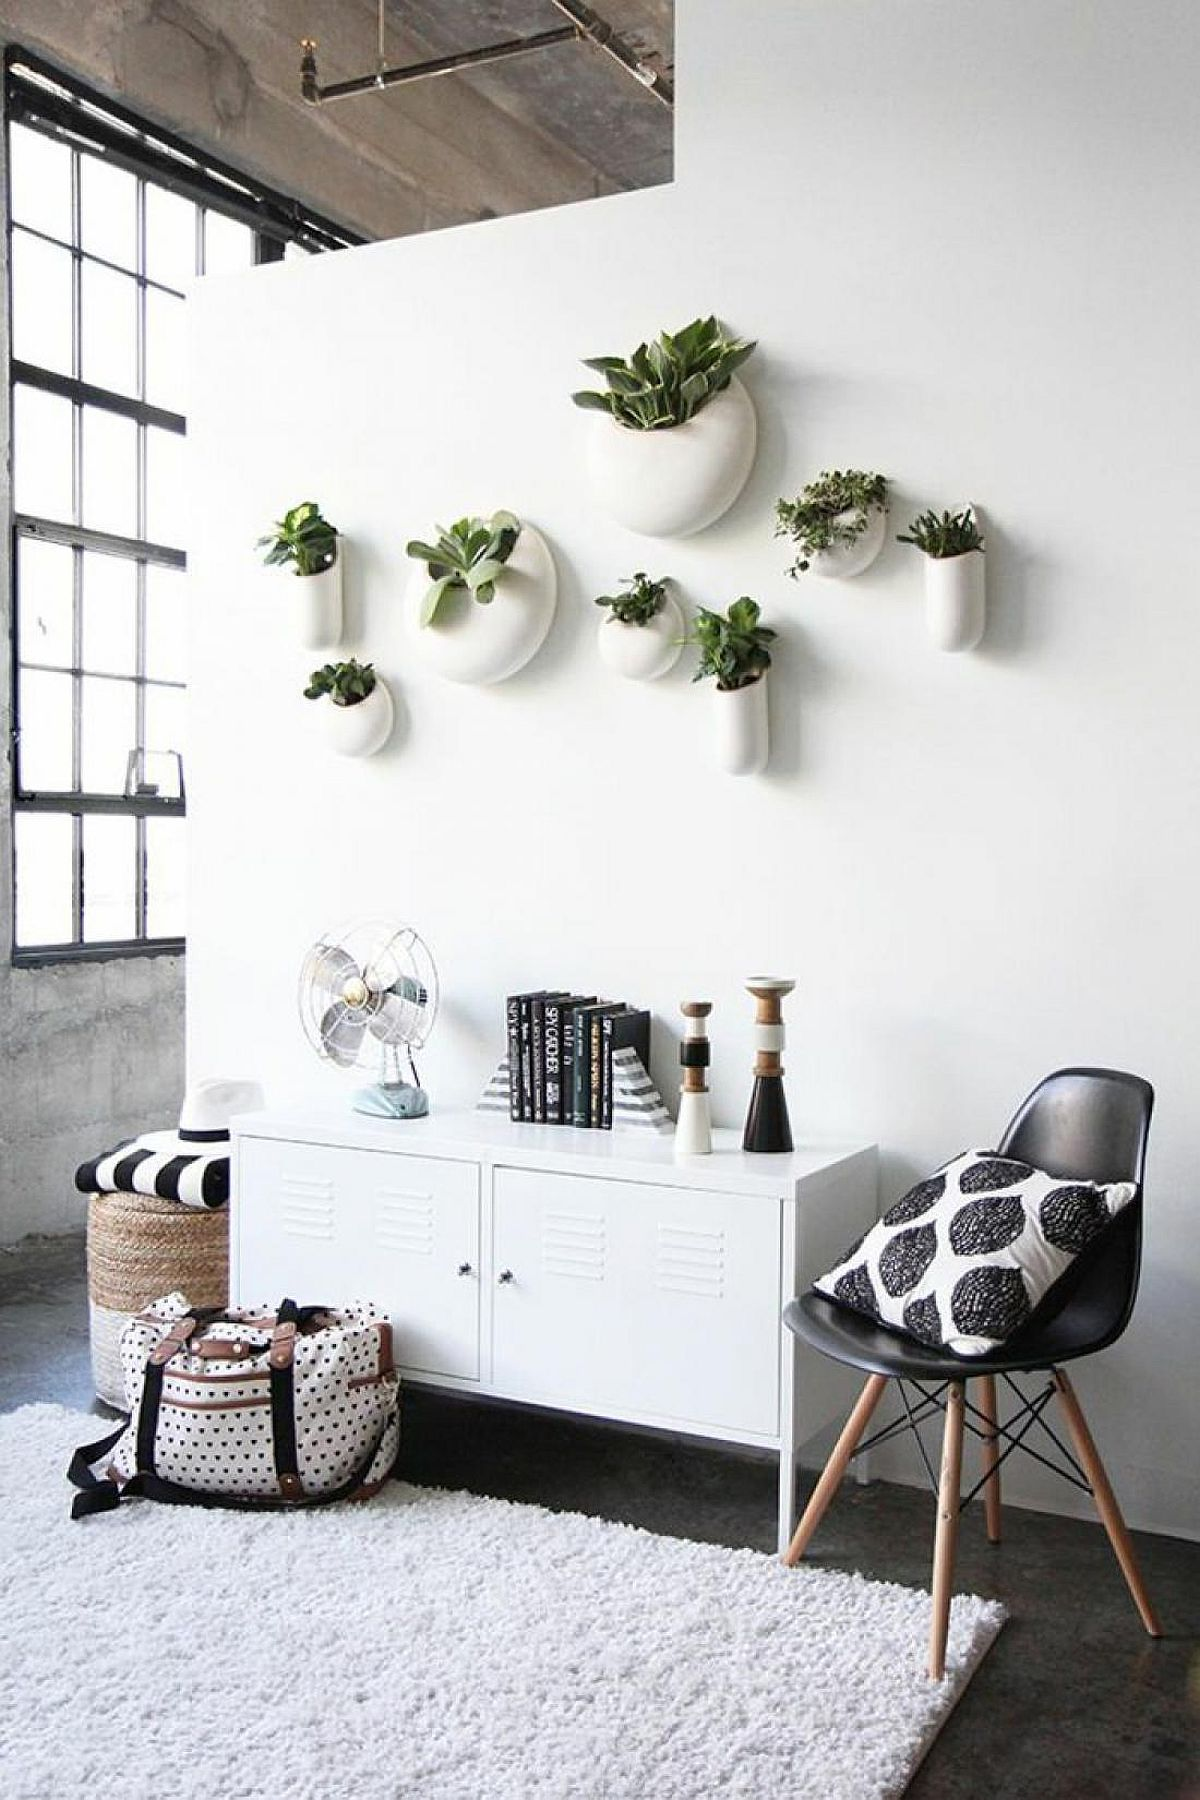 adelaparvu.com despre idei de decorare a casei cu plante (1)